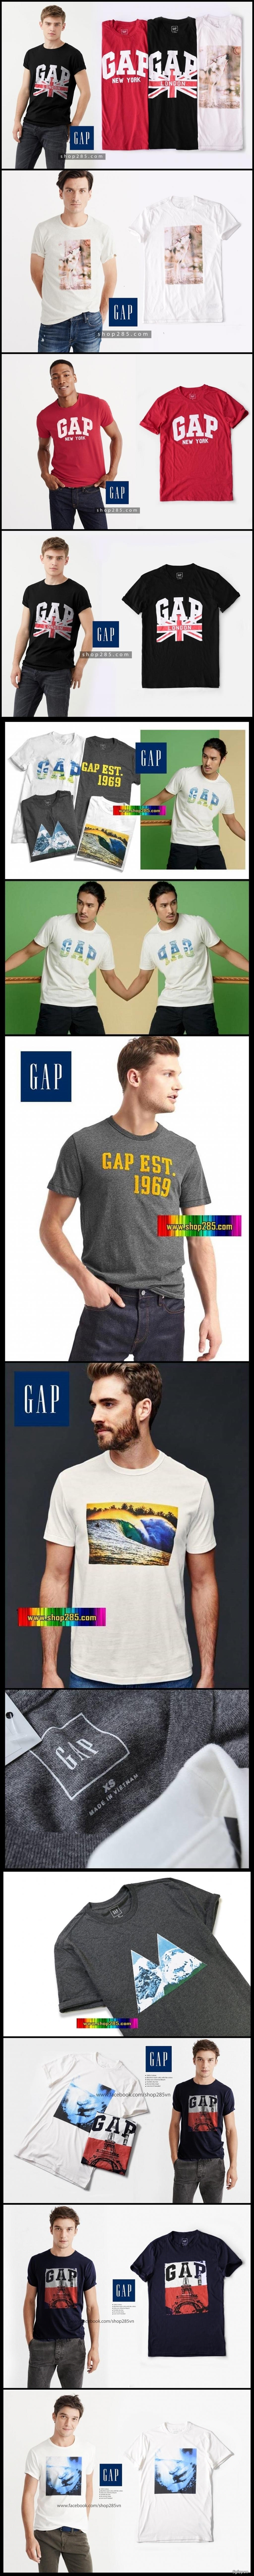 Shop285.com - Shop quần áo : Zara,Jules,Jake*s,,Hollister,Aber,CK,Tommy,Levis - 8